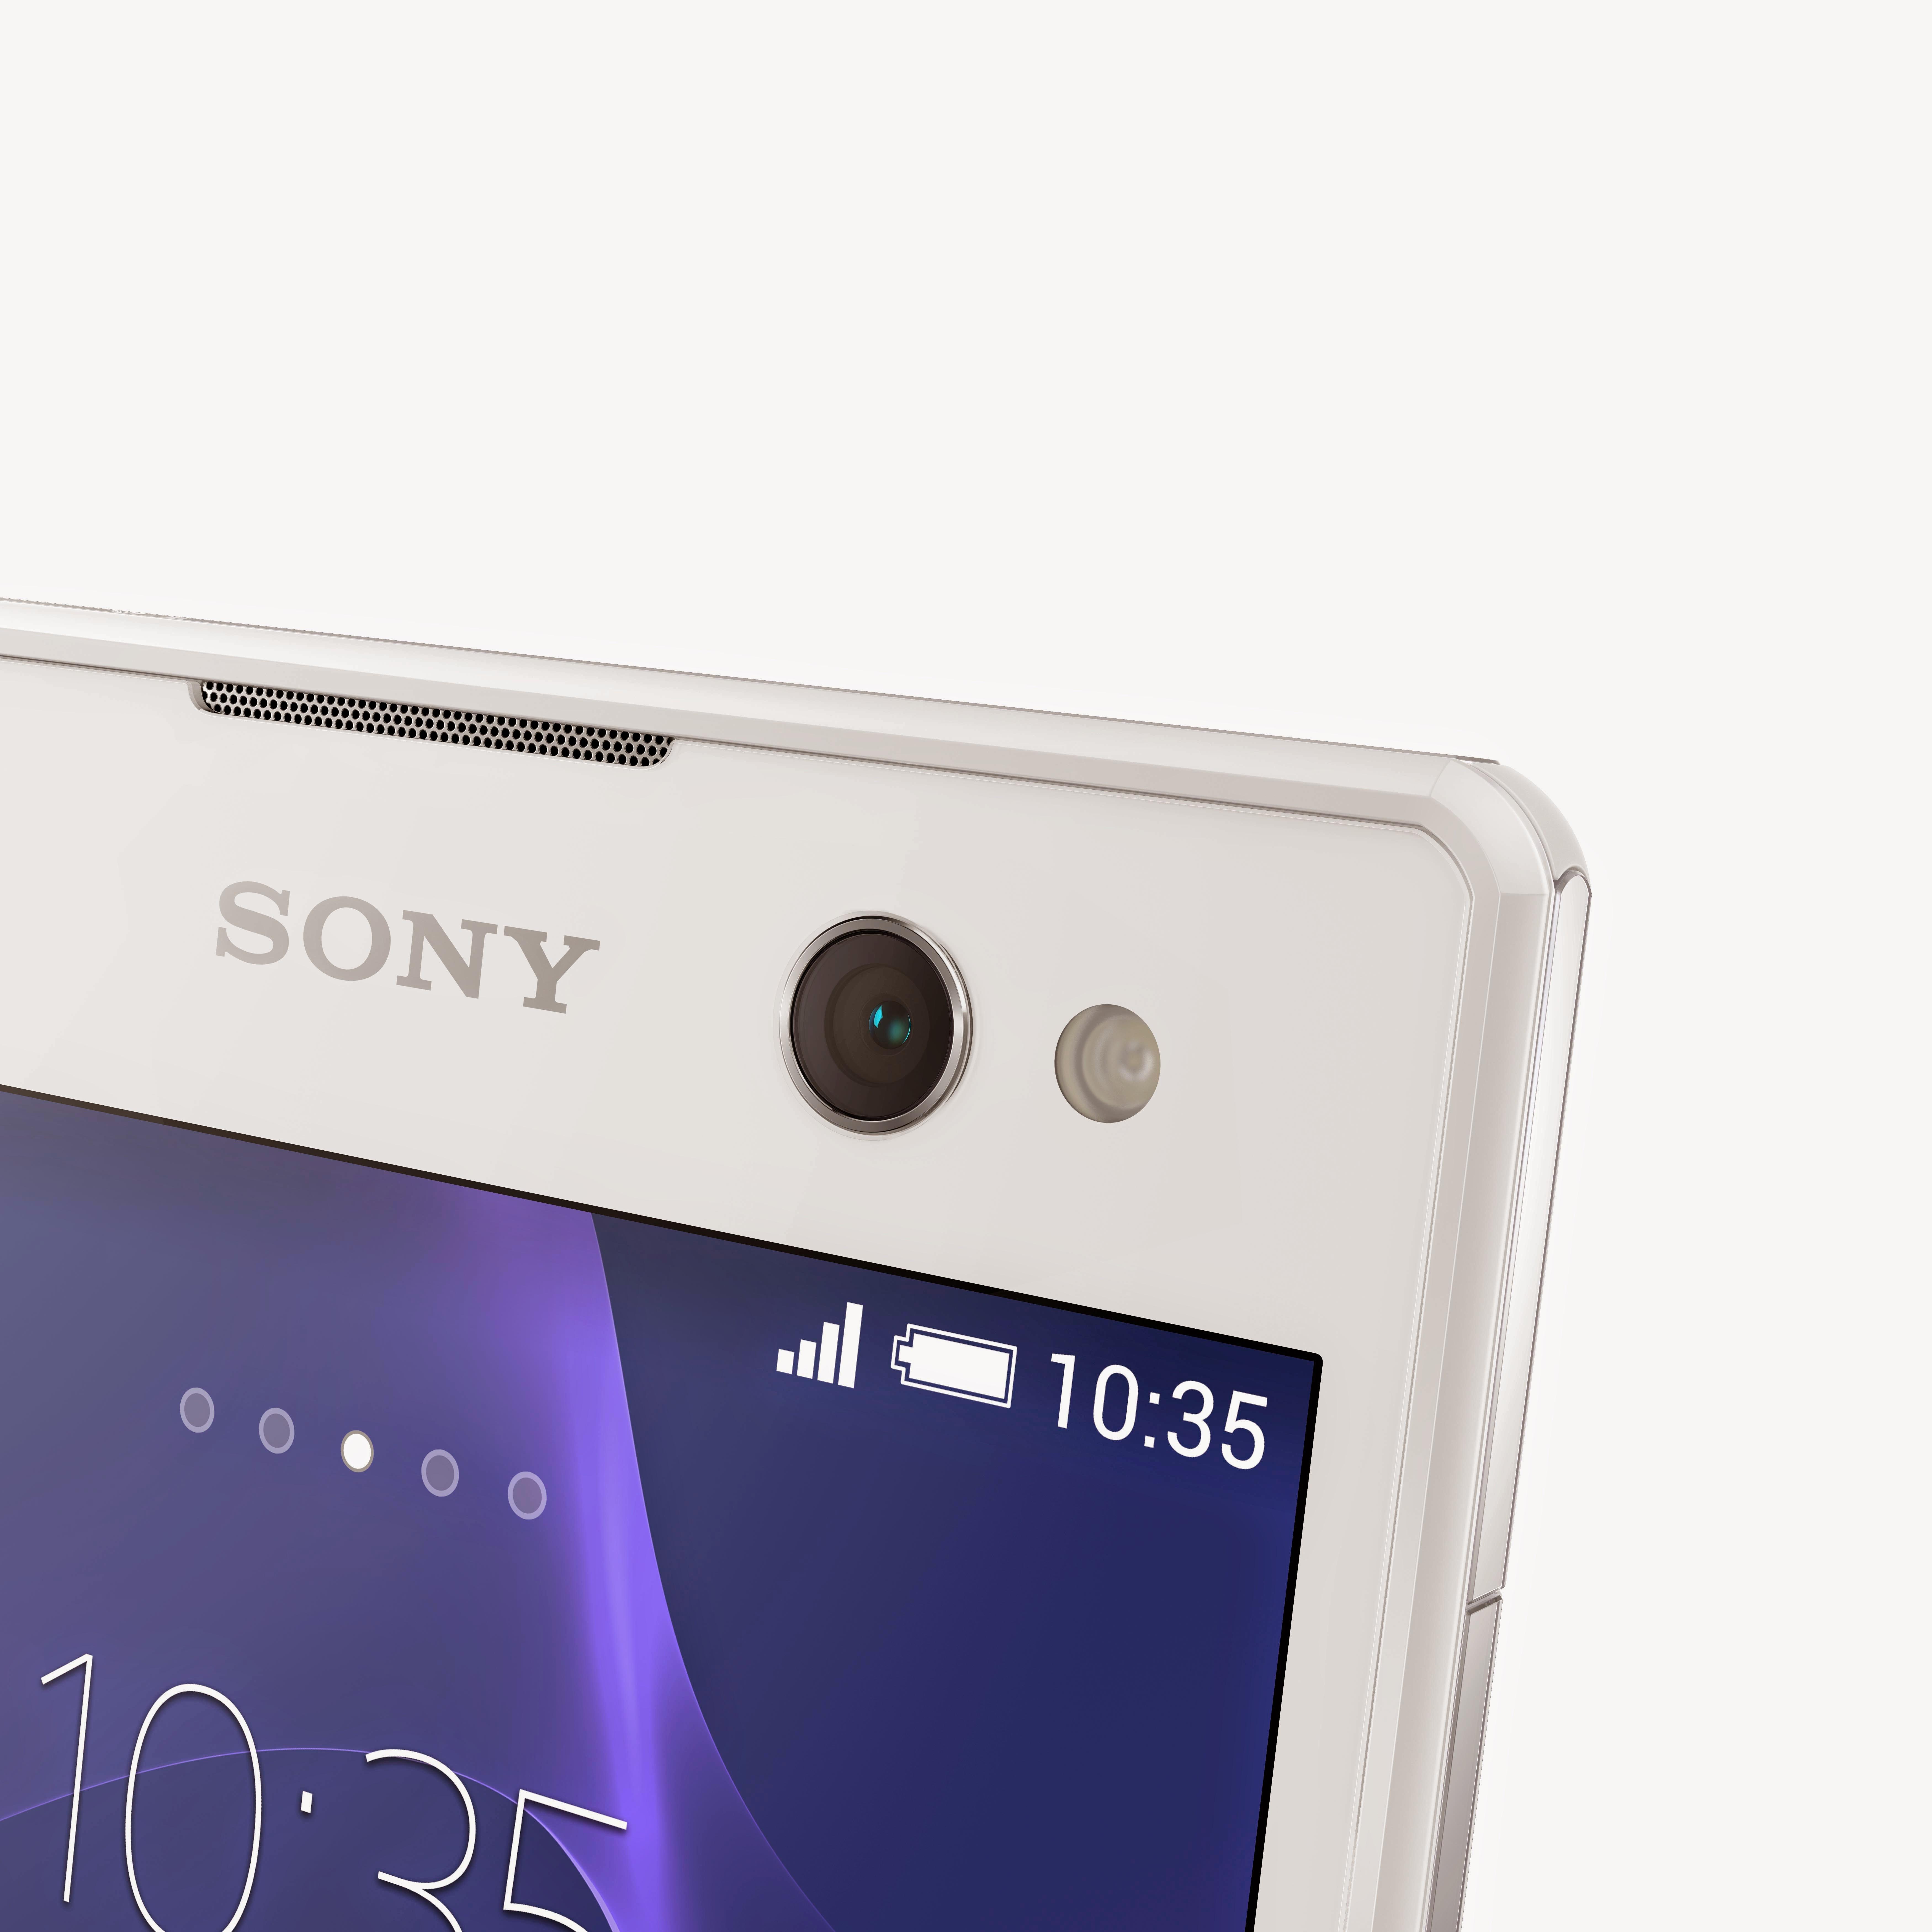 Sony Xperia C3 (Dual) : LE selfiephone